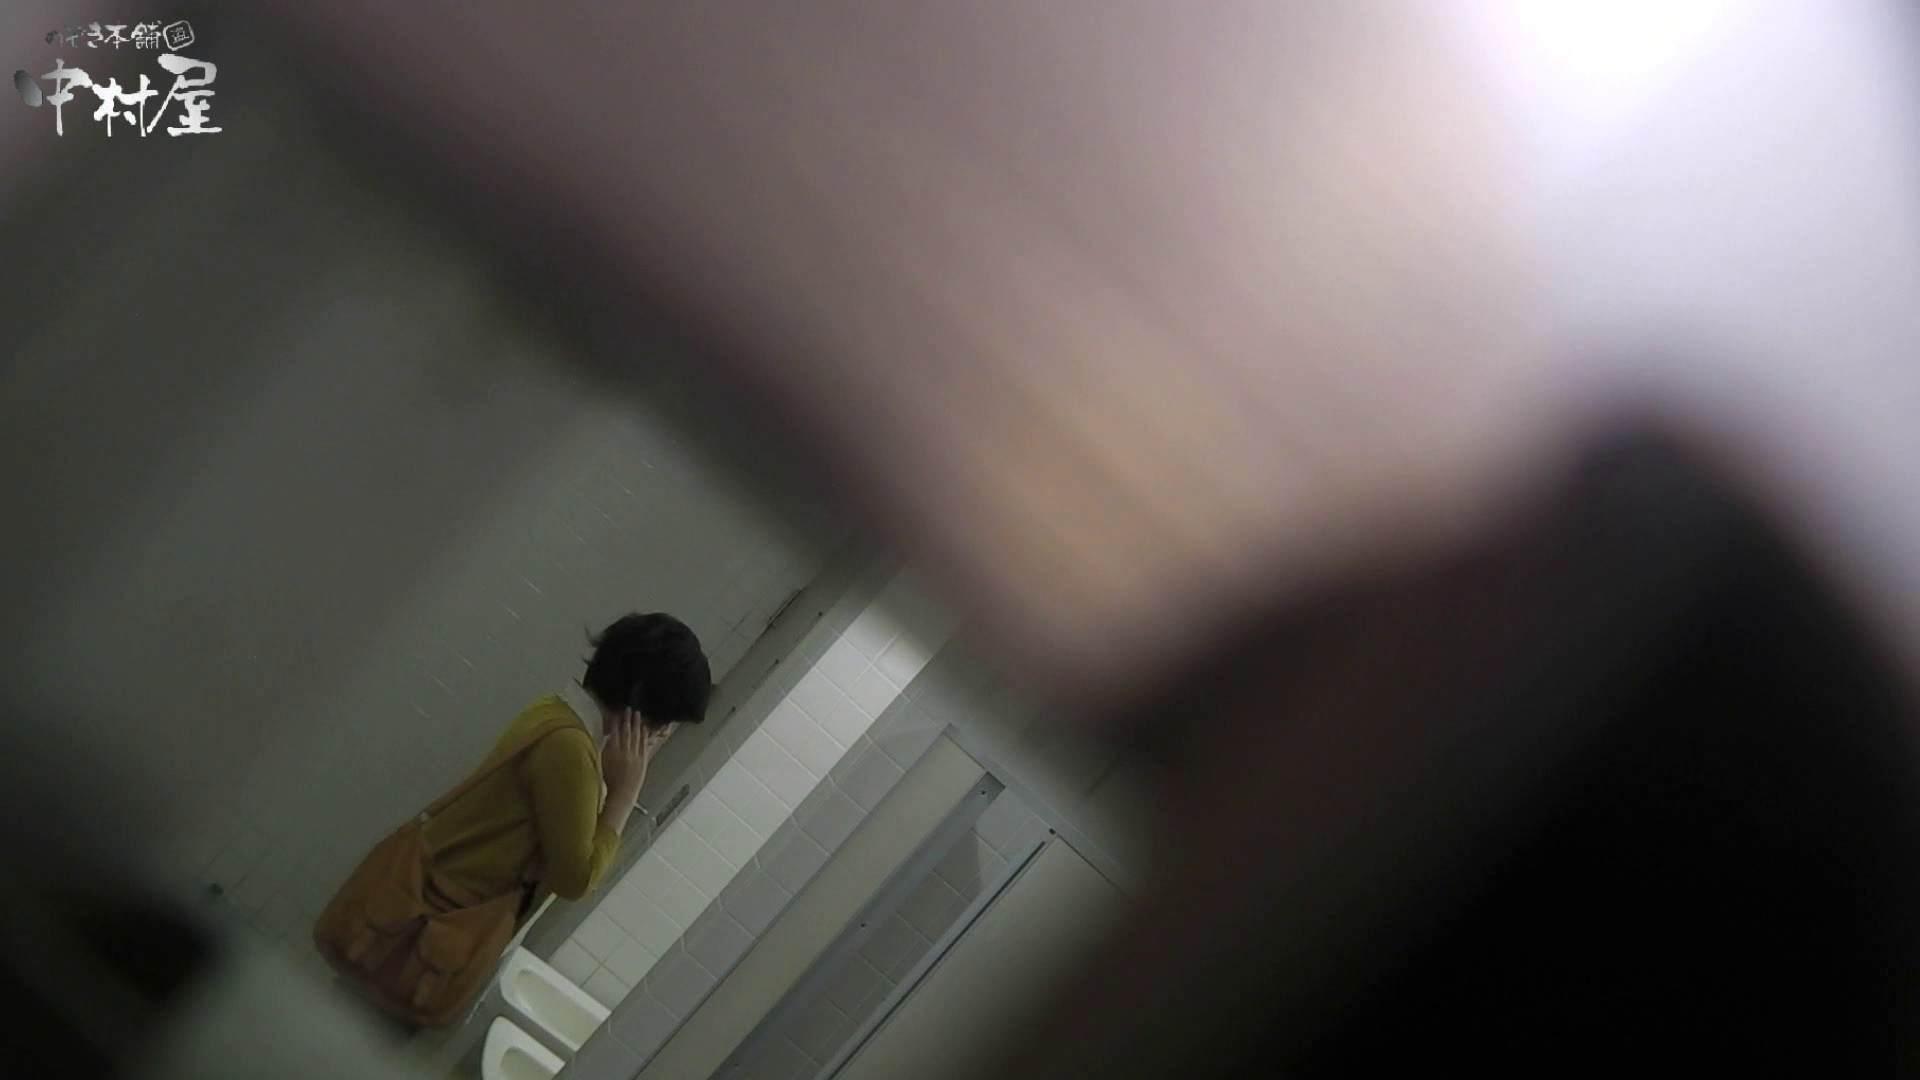 vol.54 命がけ潜伏洗面所! ヲリモノとろりん後編 プライベート | 洗面所編  87PIX 67